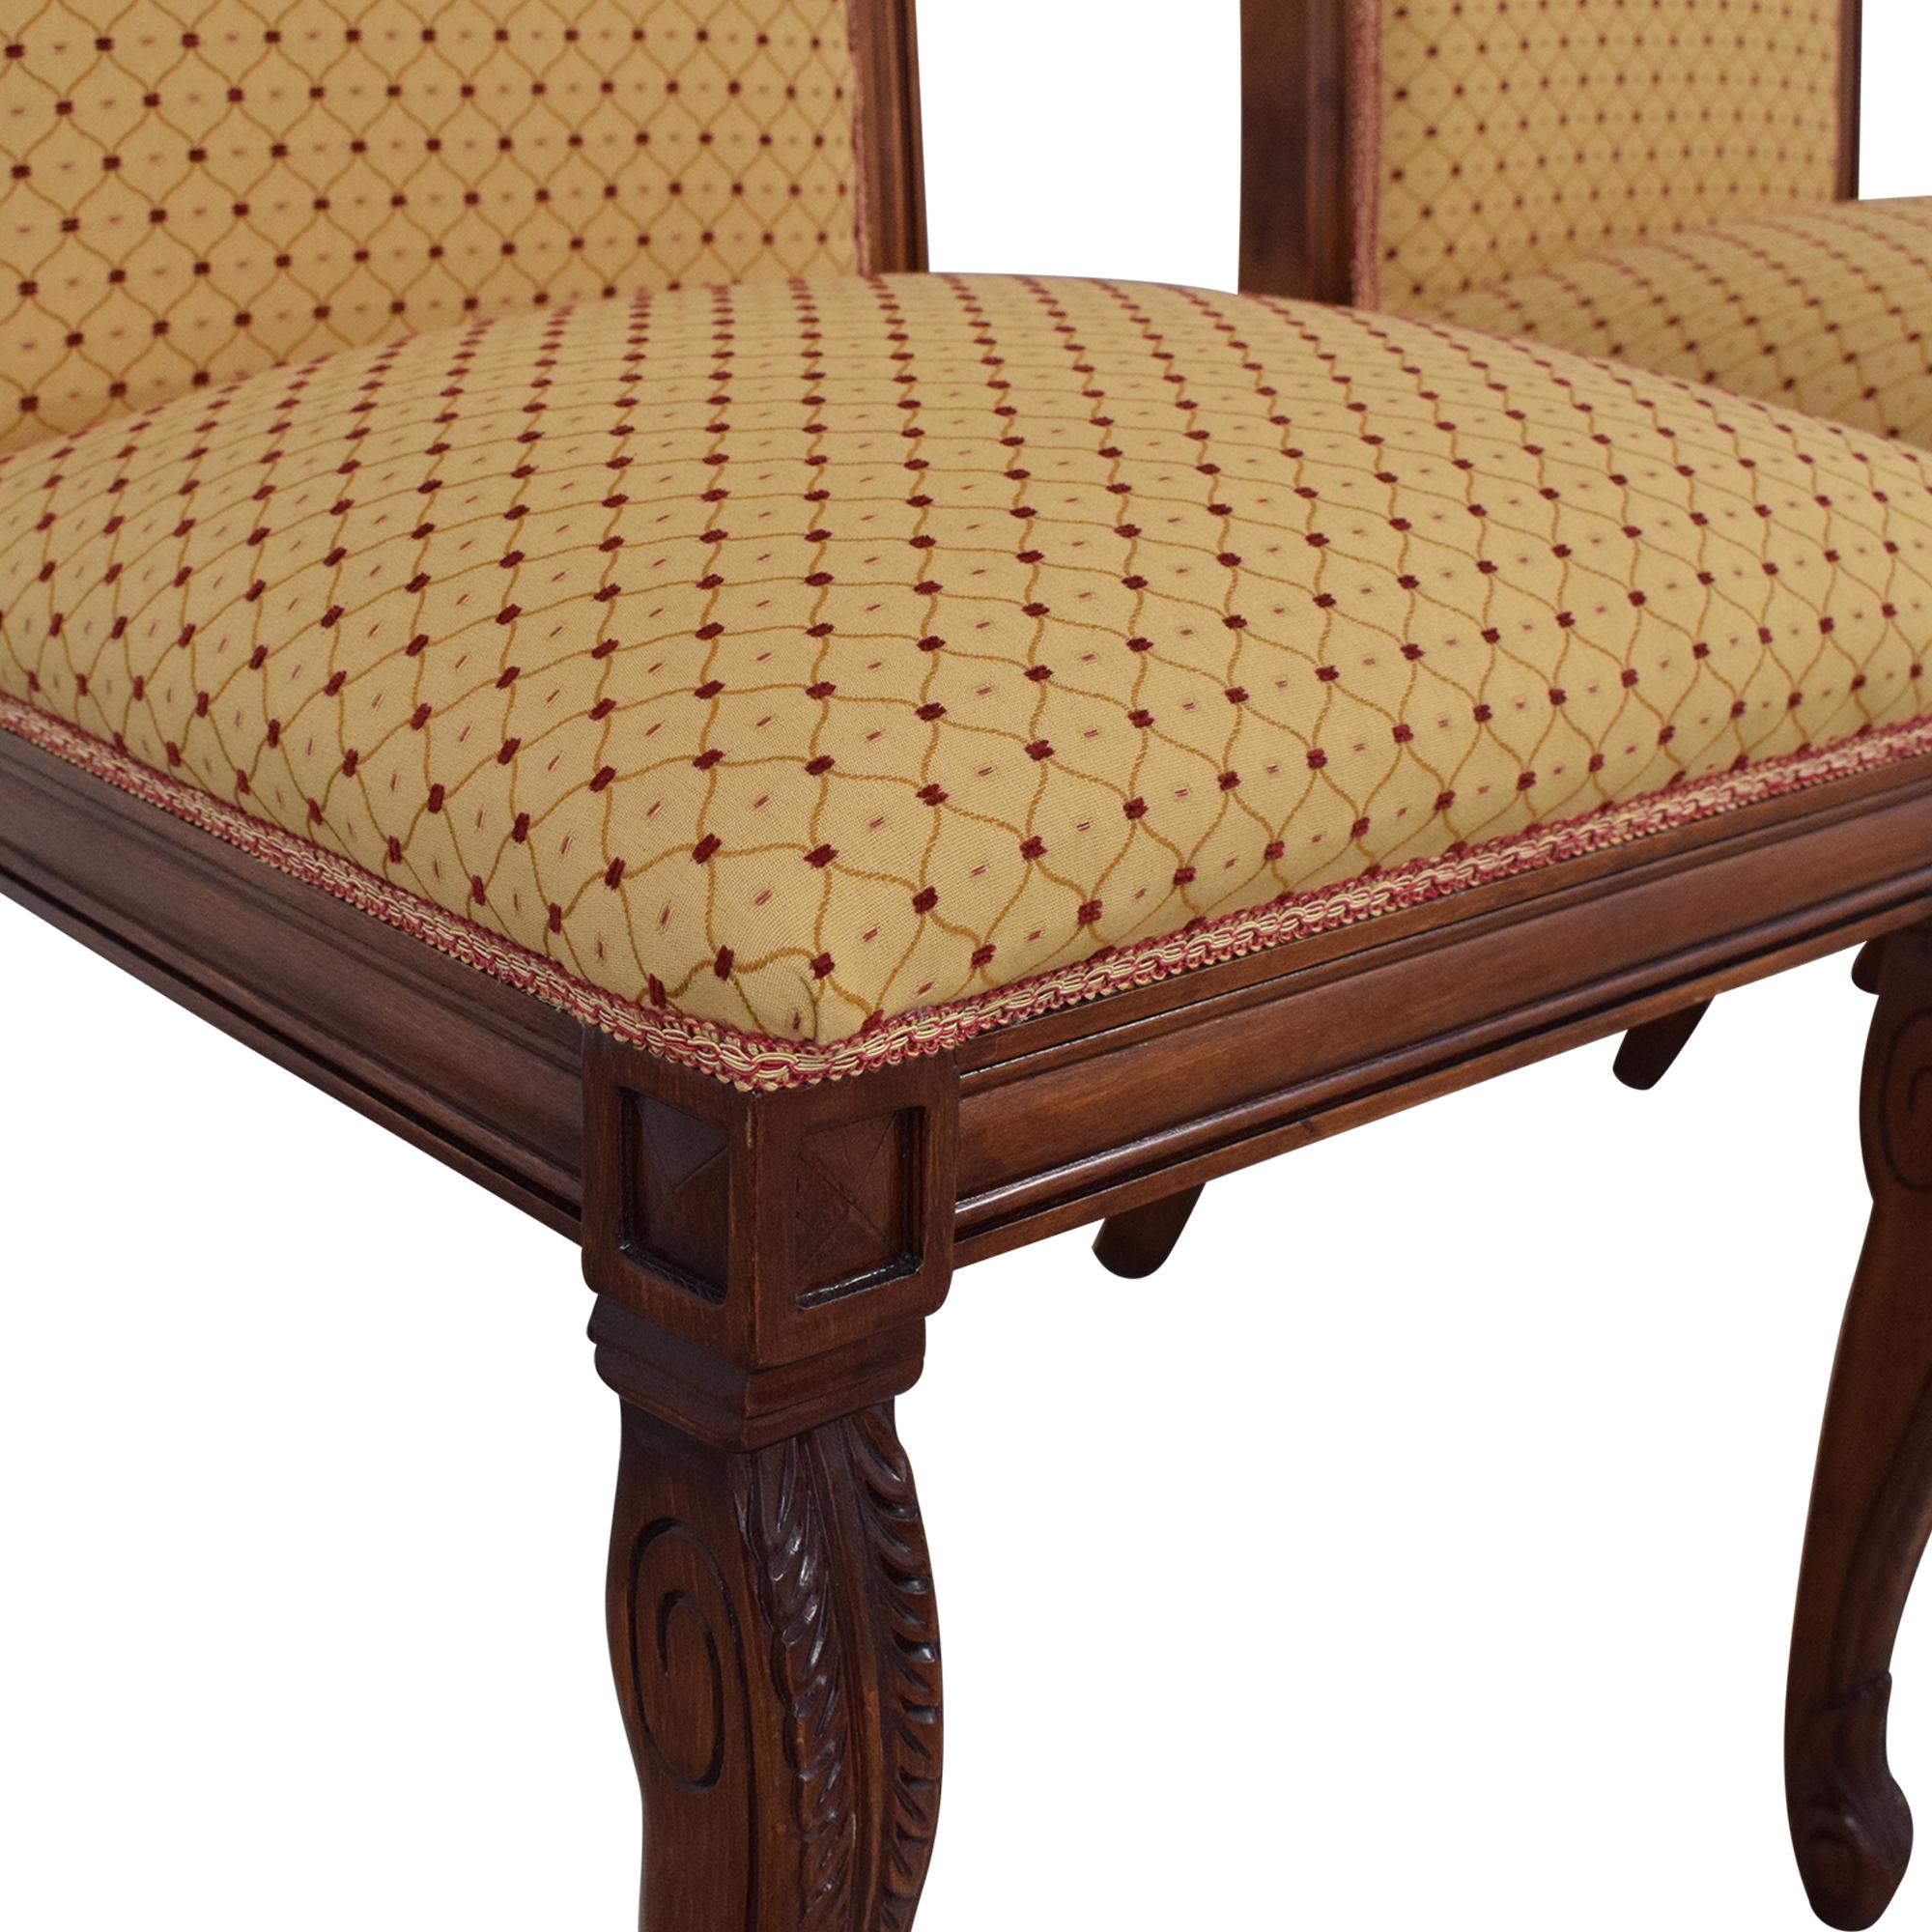 KPS Furnishings Custom Dining Chairs / Dining Chairs